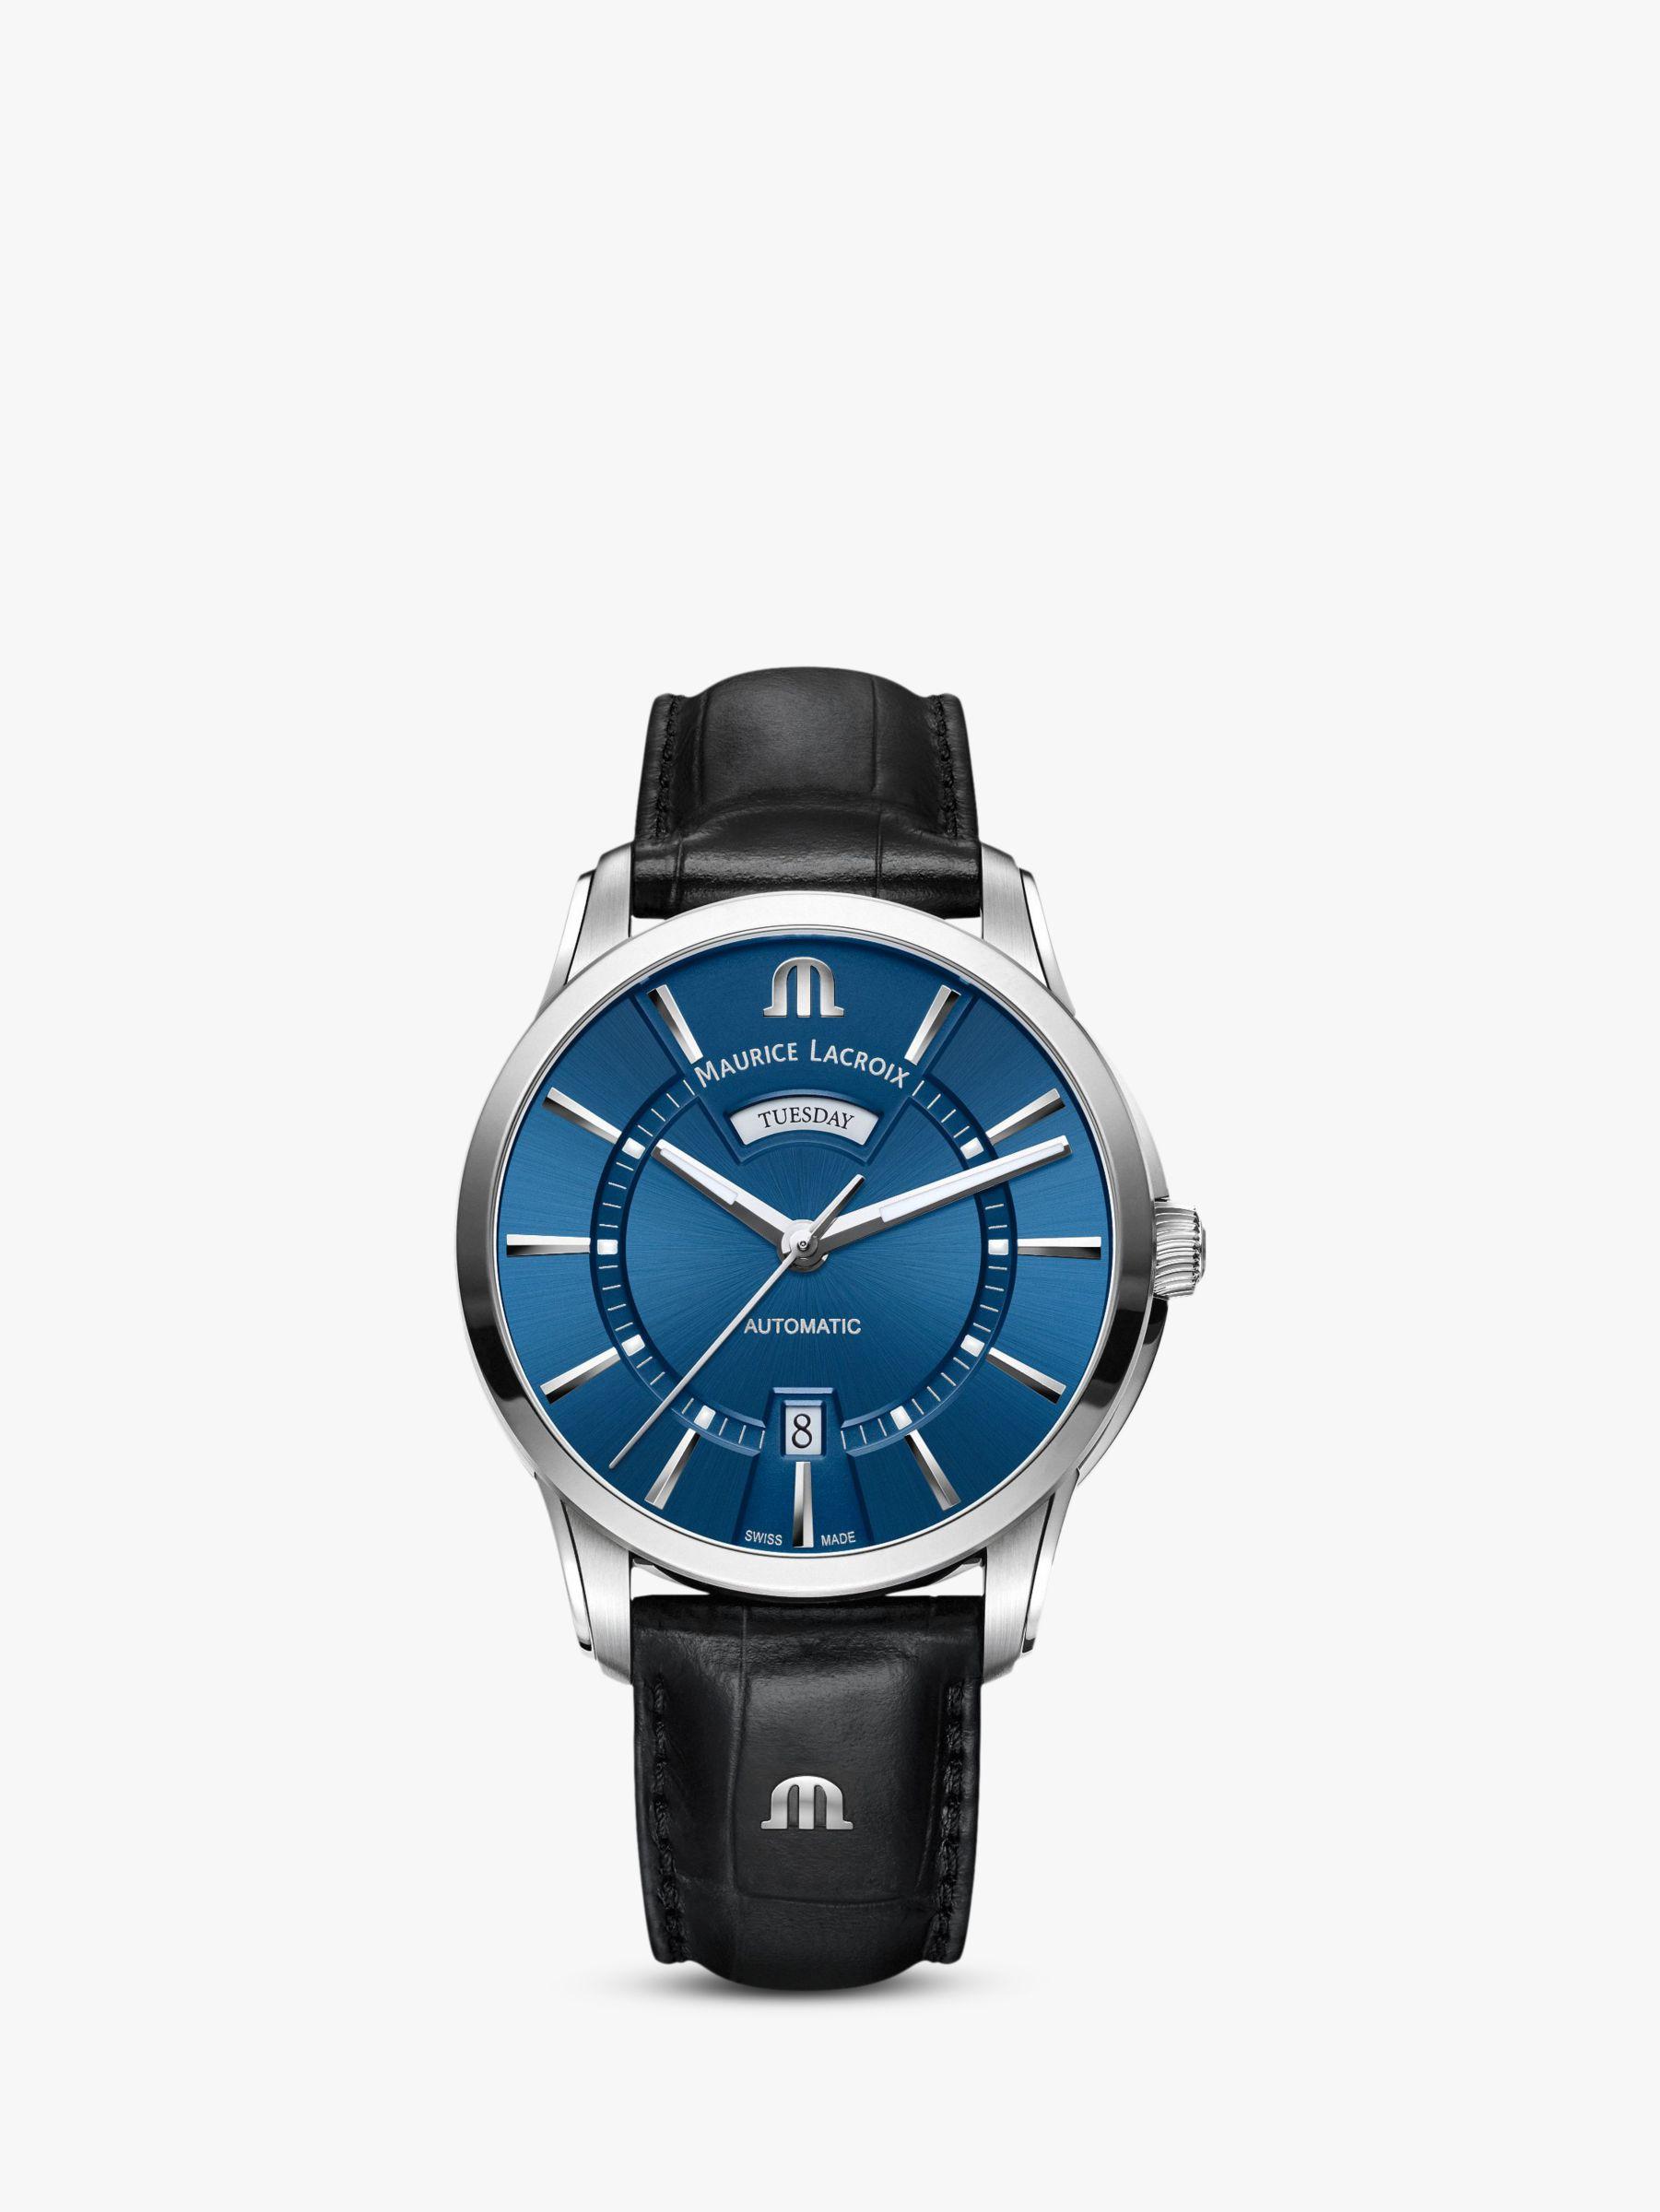 Maurice Lacroix Maurice Lacroix PT6358-SS001-430-1 Men's Pontos Automatic Day Date Leather Strap Watch, Black/Blue